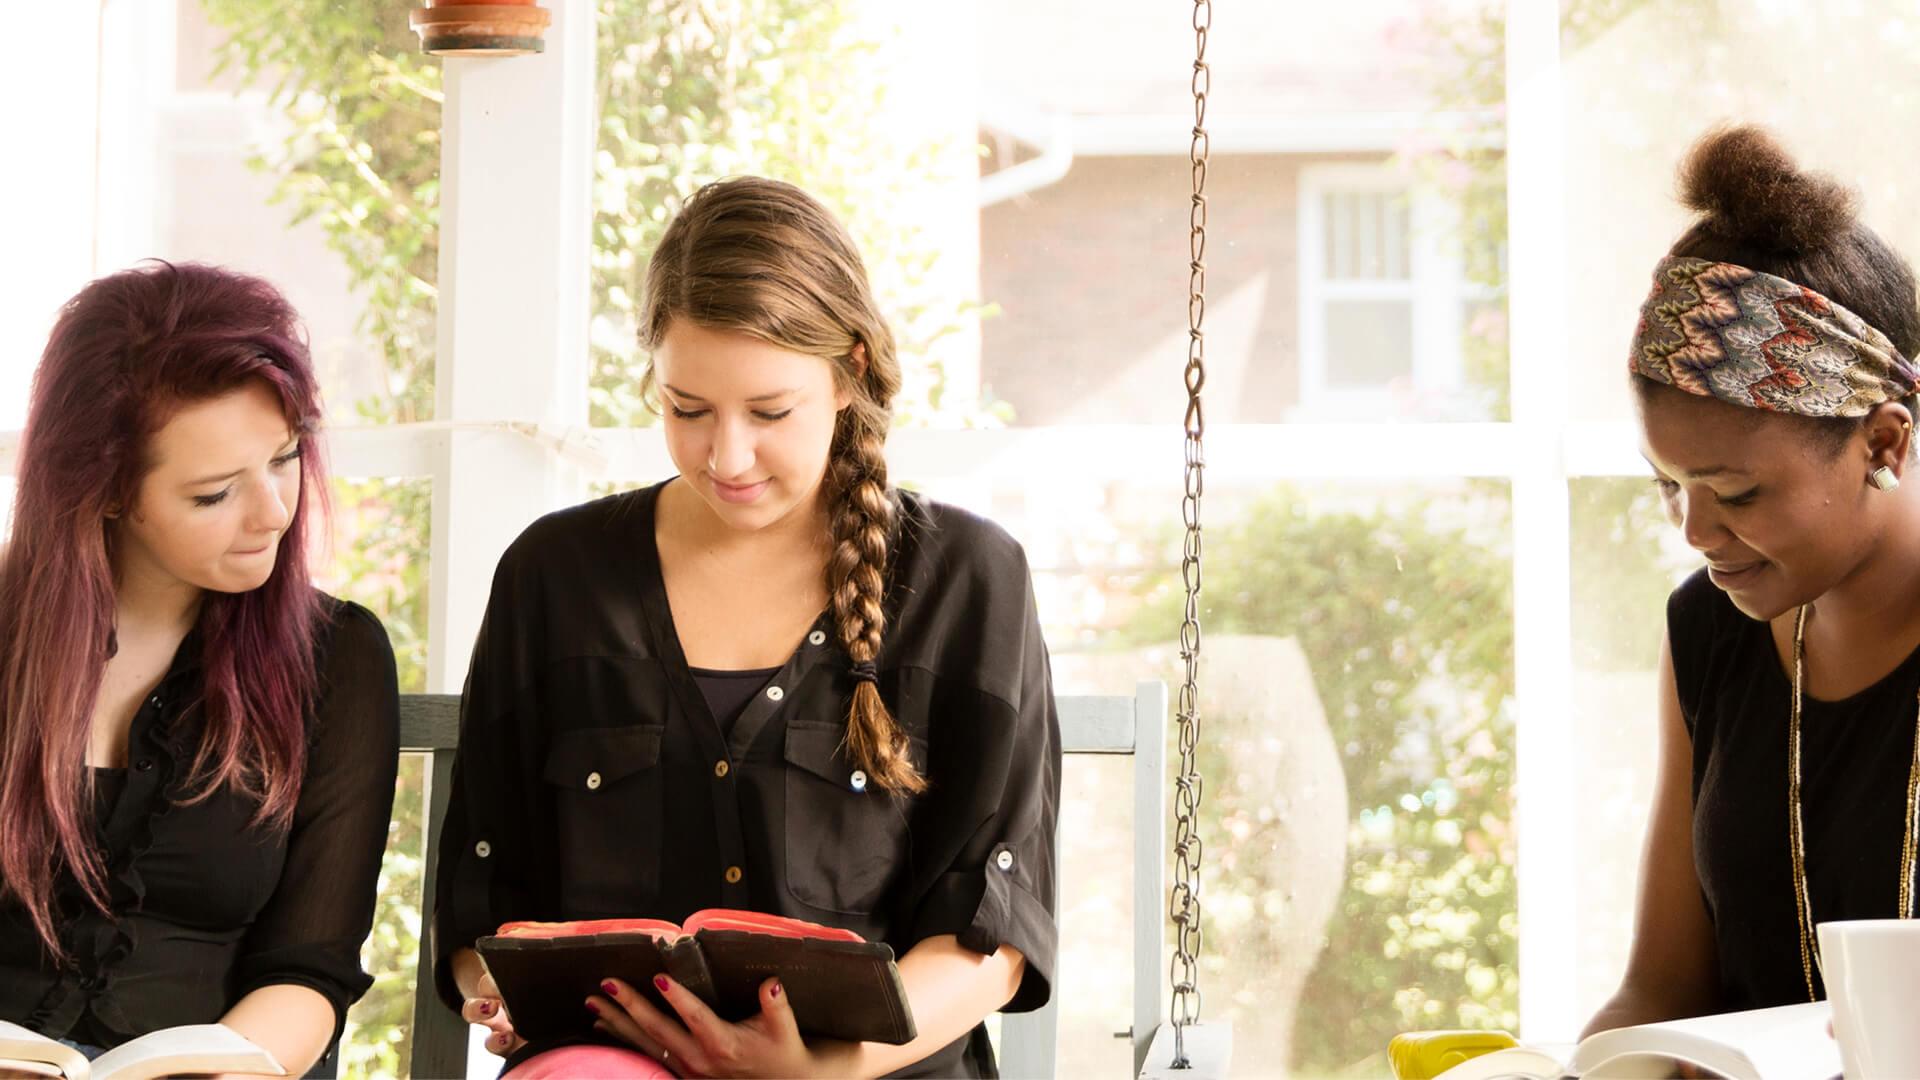 Become a Lifelong Learner of God's Word